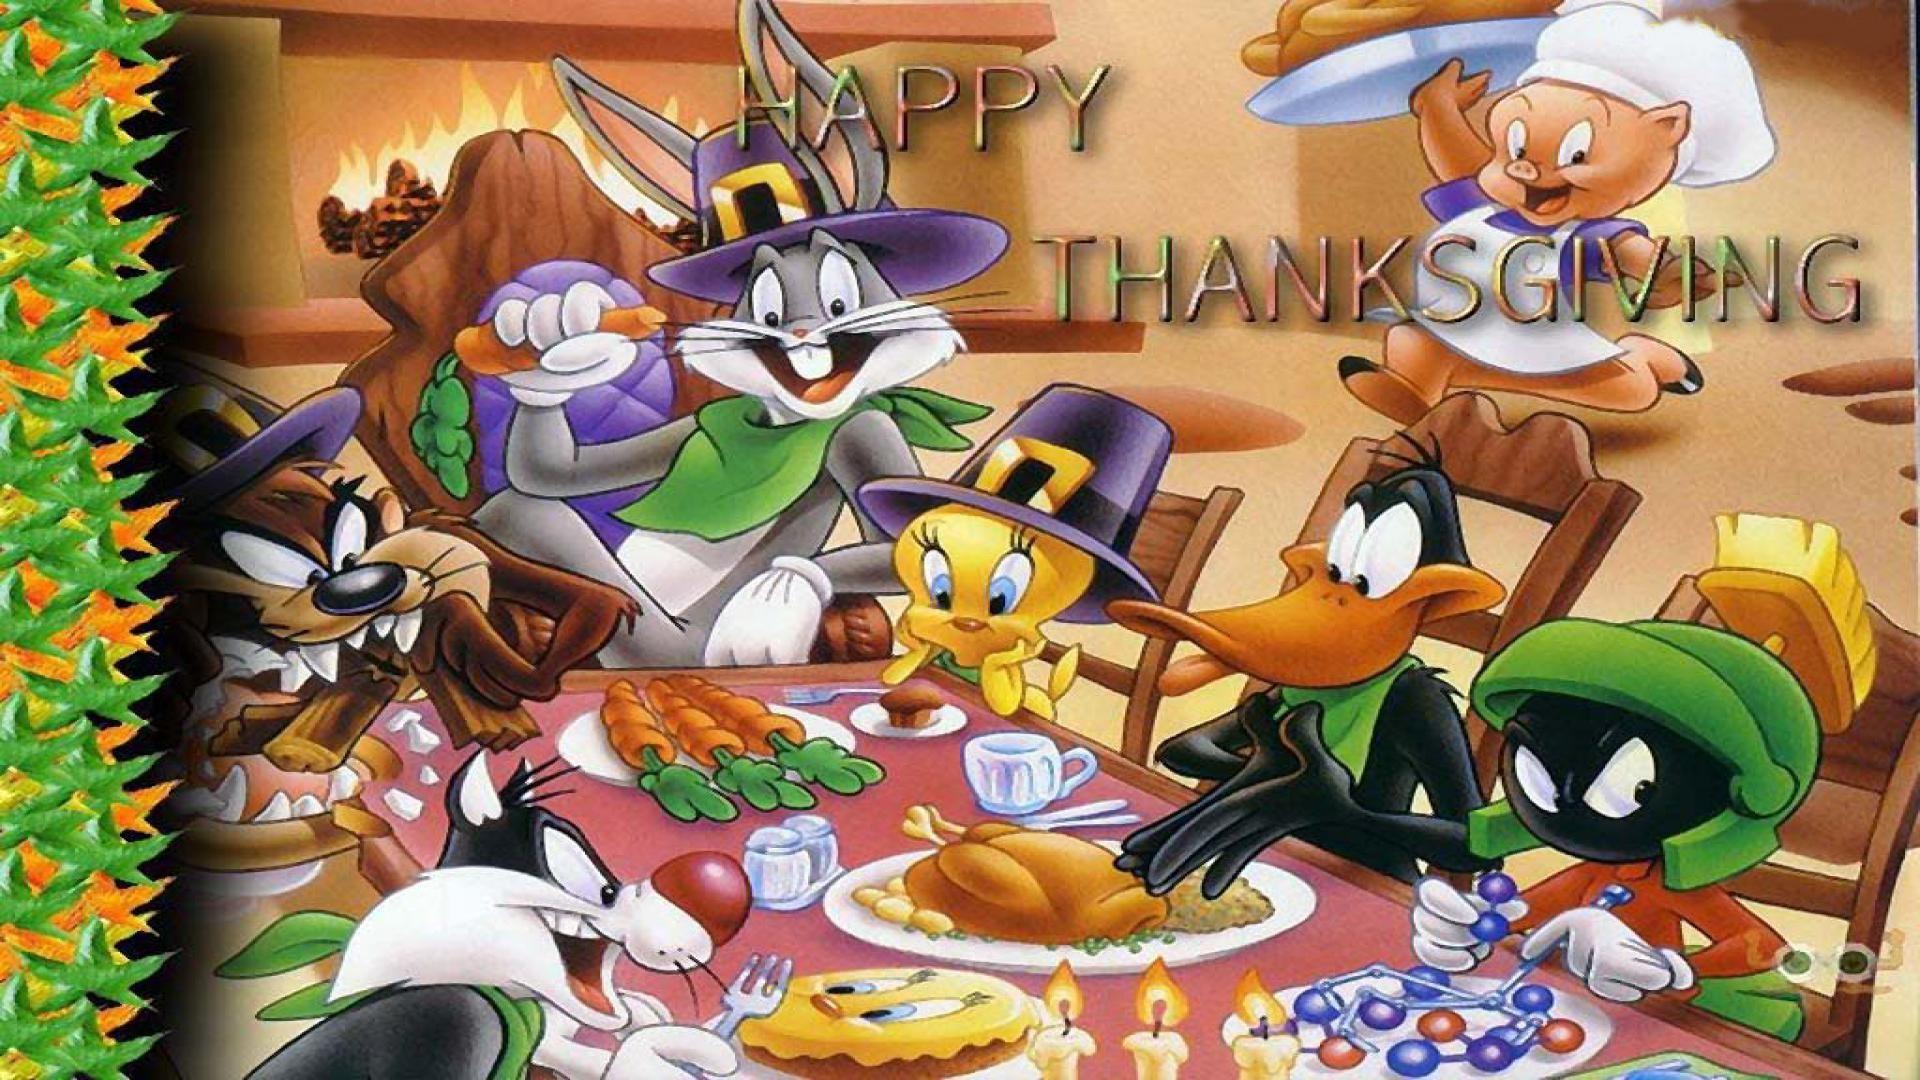 Thanksgiving Wallpapers Cartoon.